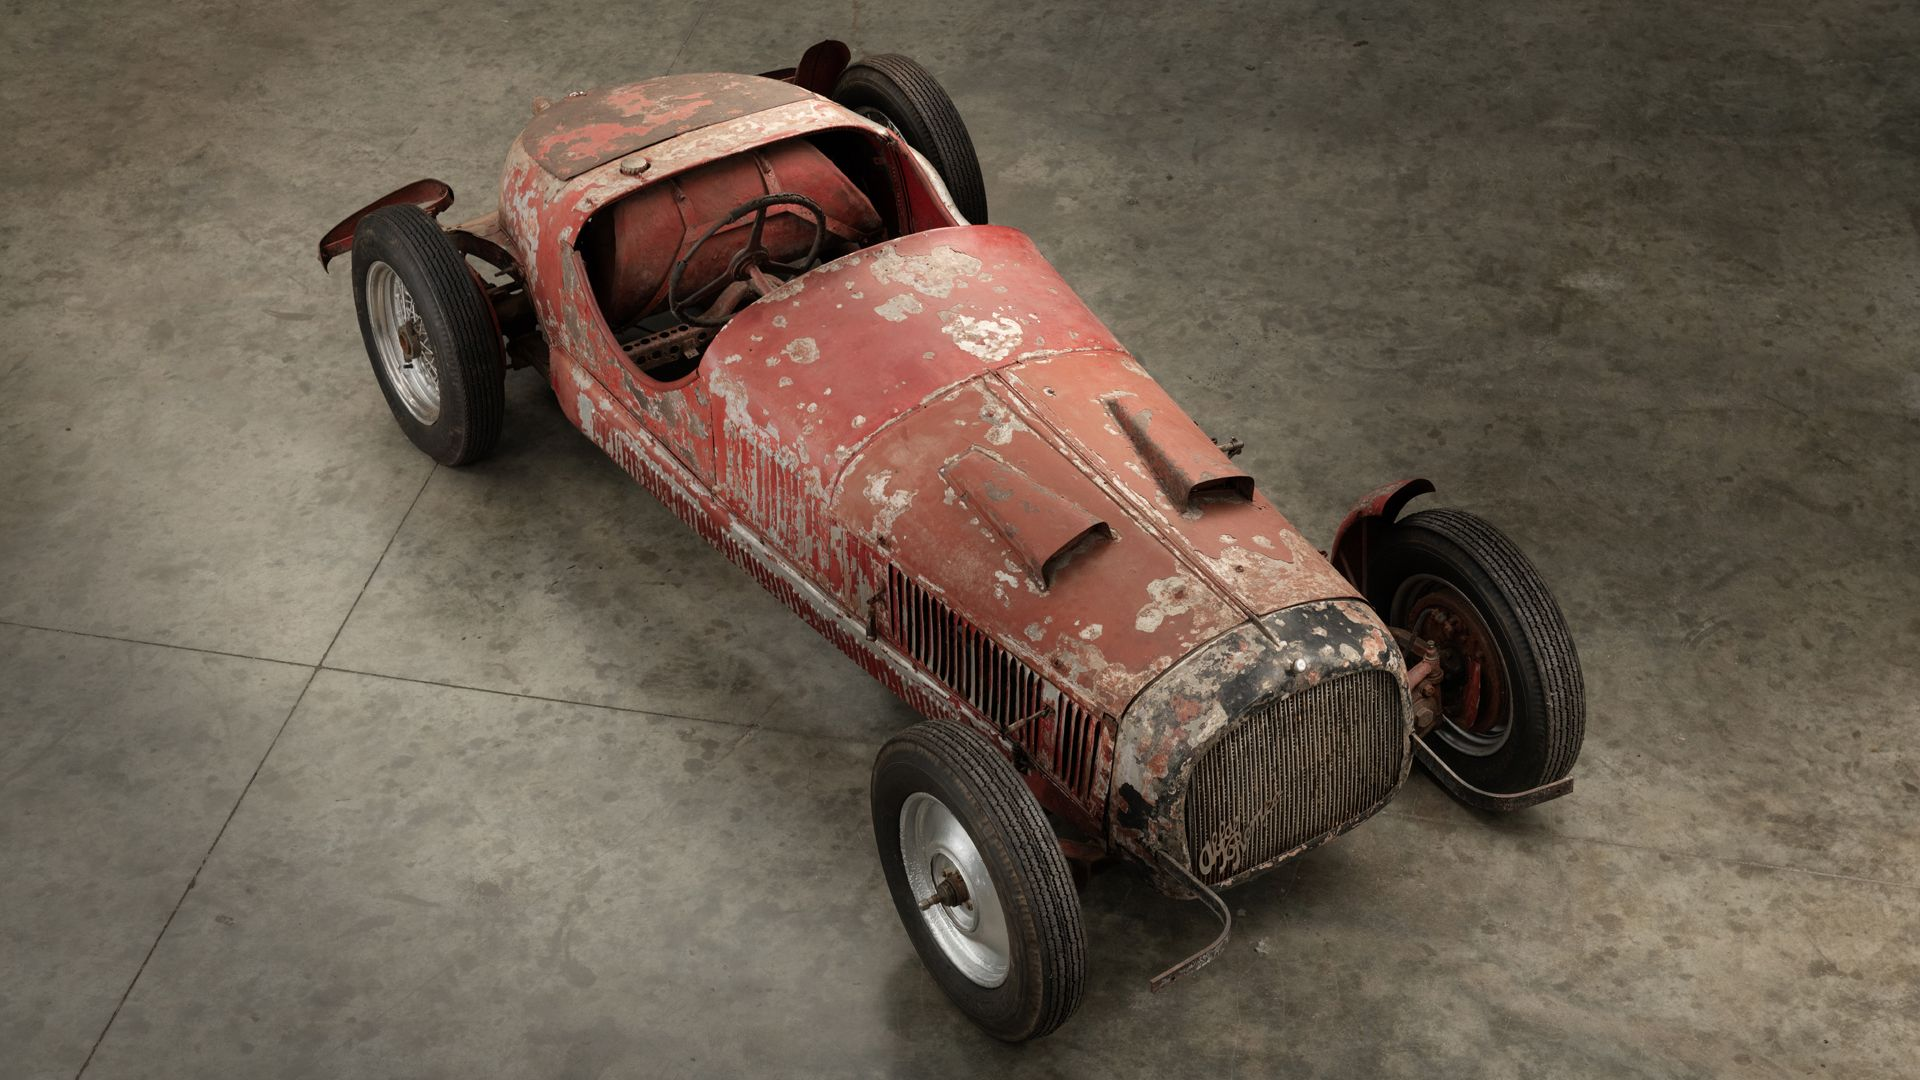 Mussolini's Alfa Romeo is being restored